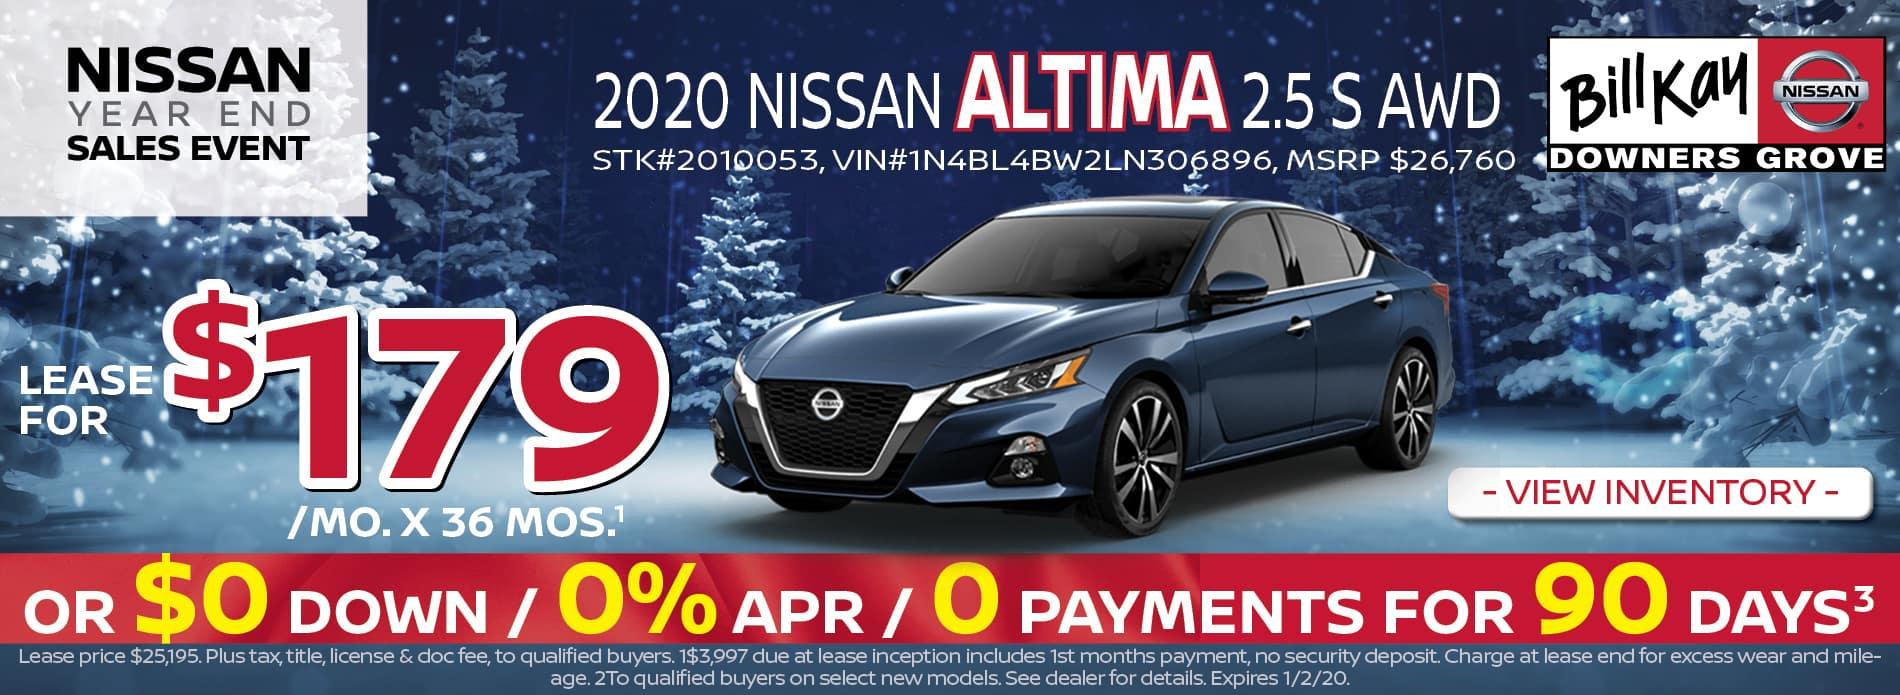 2020 Nissan Altima 2.5